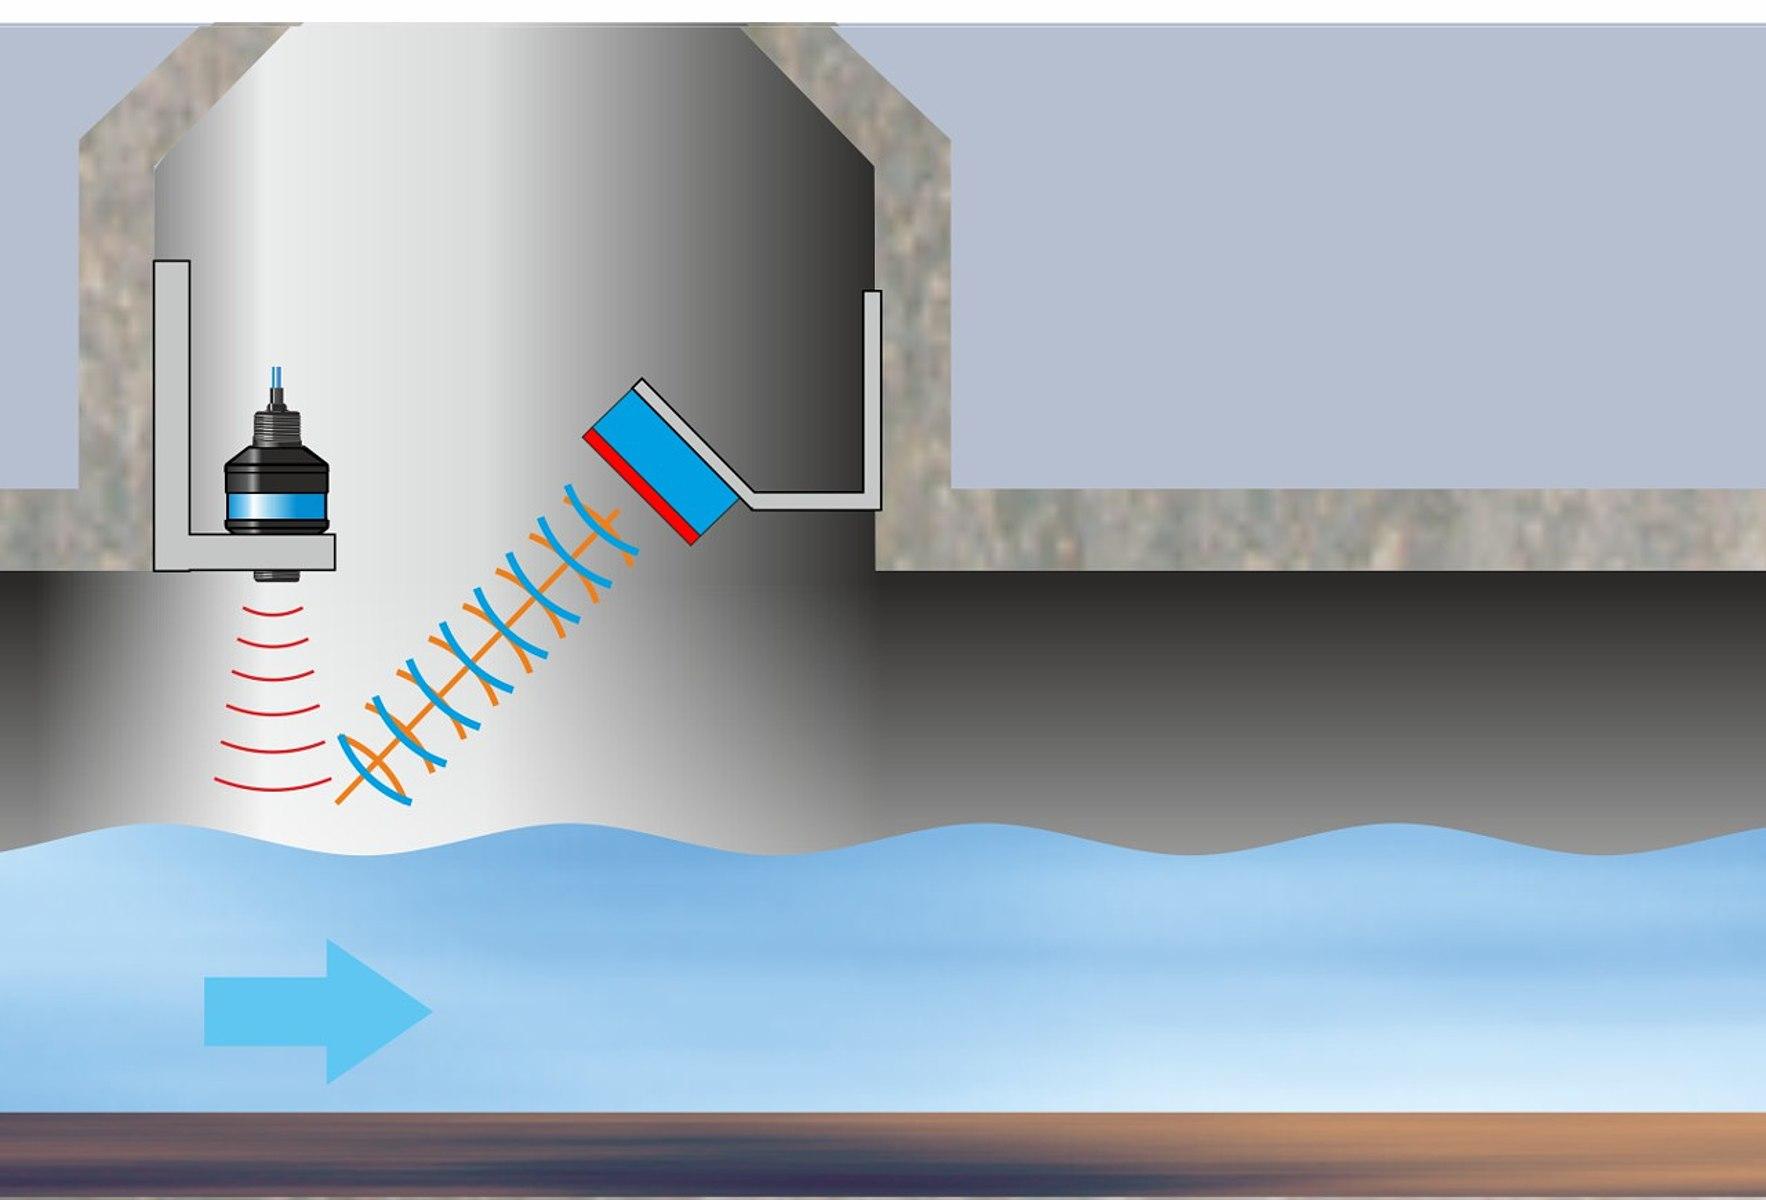 Csm Radar Flow Levelspeparate E A on Ultrasonic Level Sensor Installation